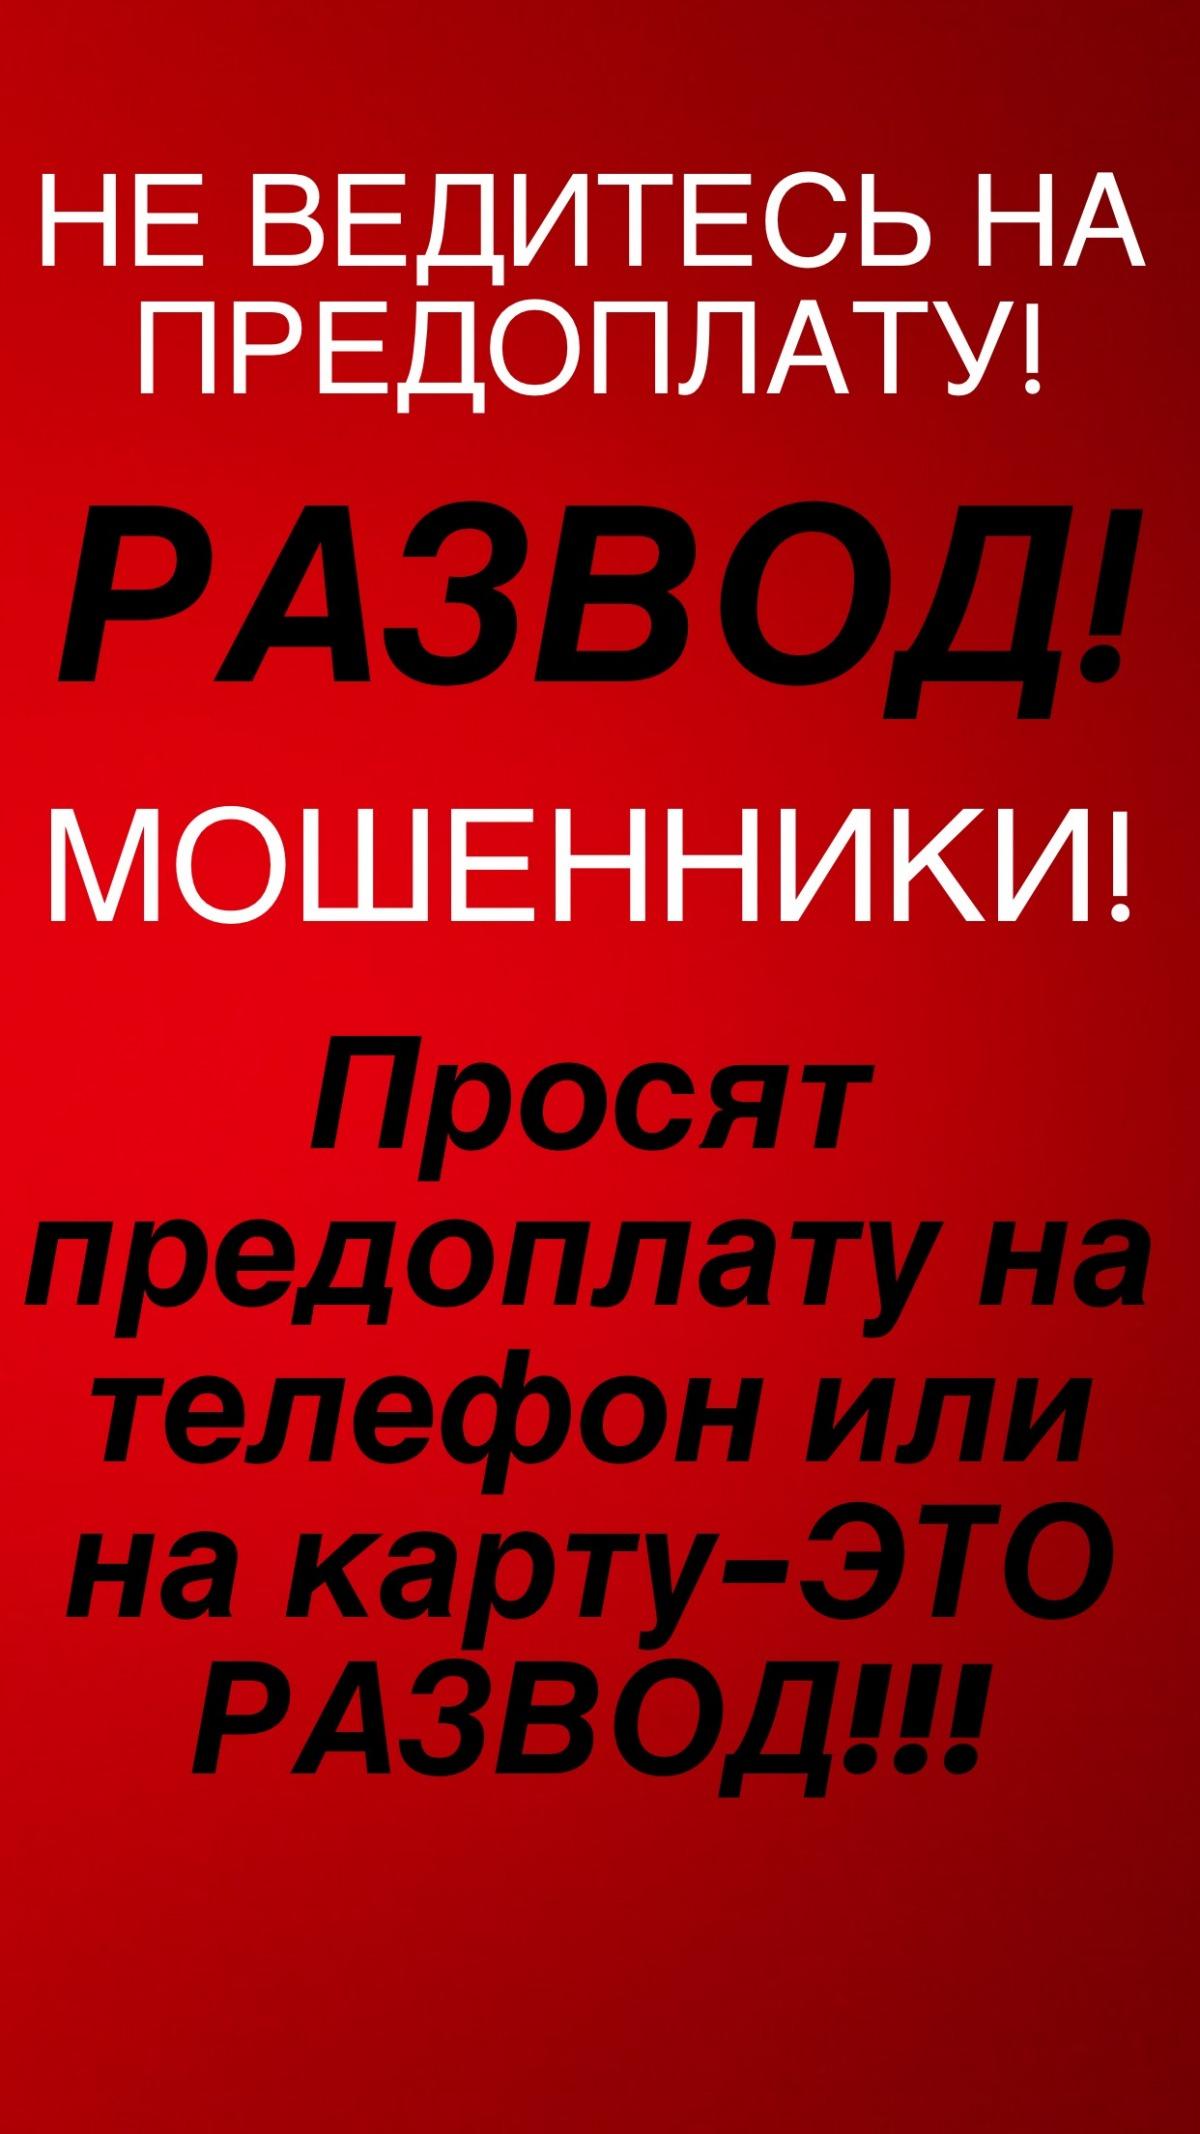 Anadyr  Online  Главные публикации